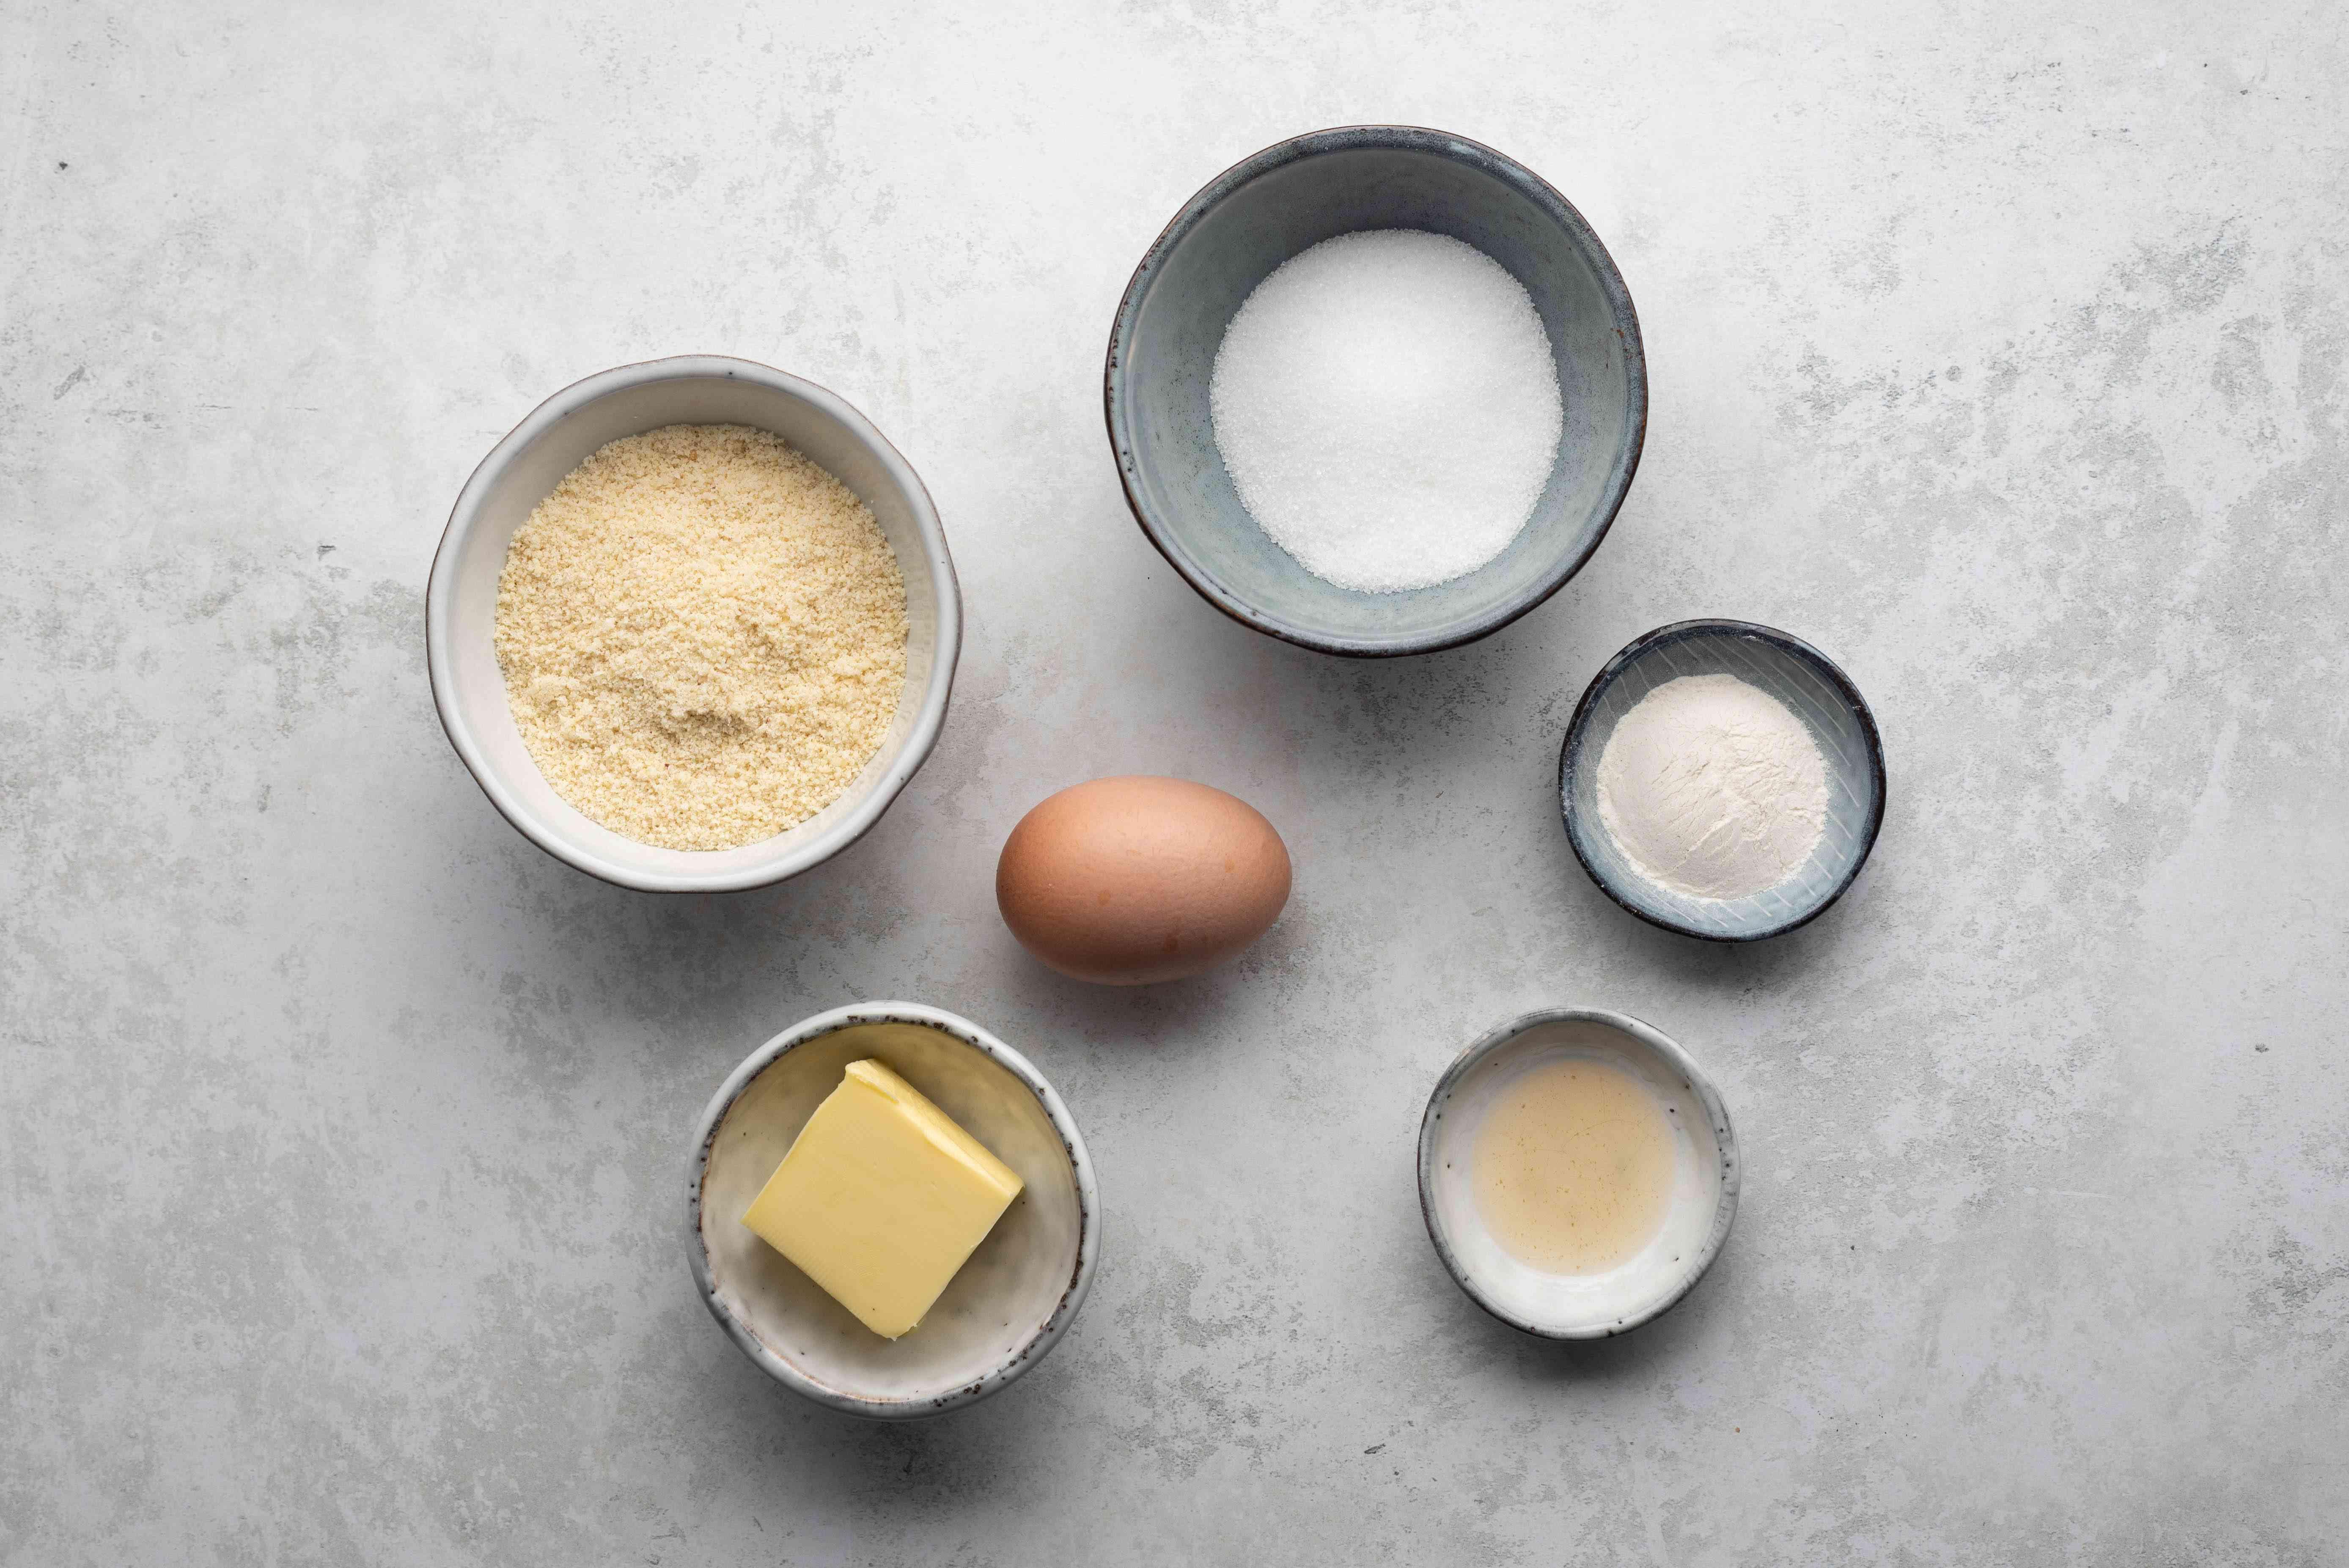 Almond Cream ingredients